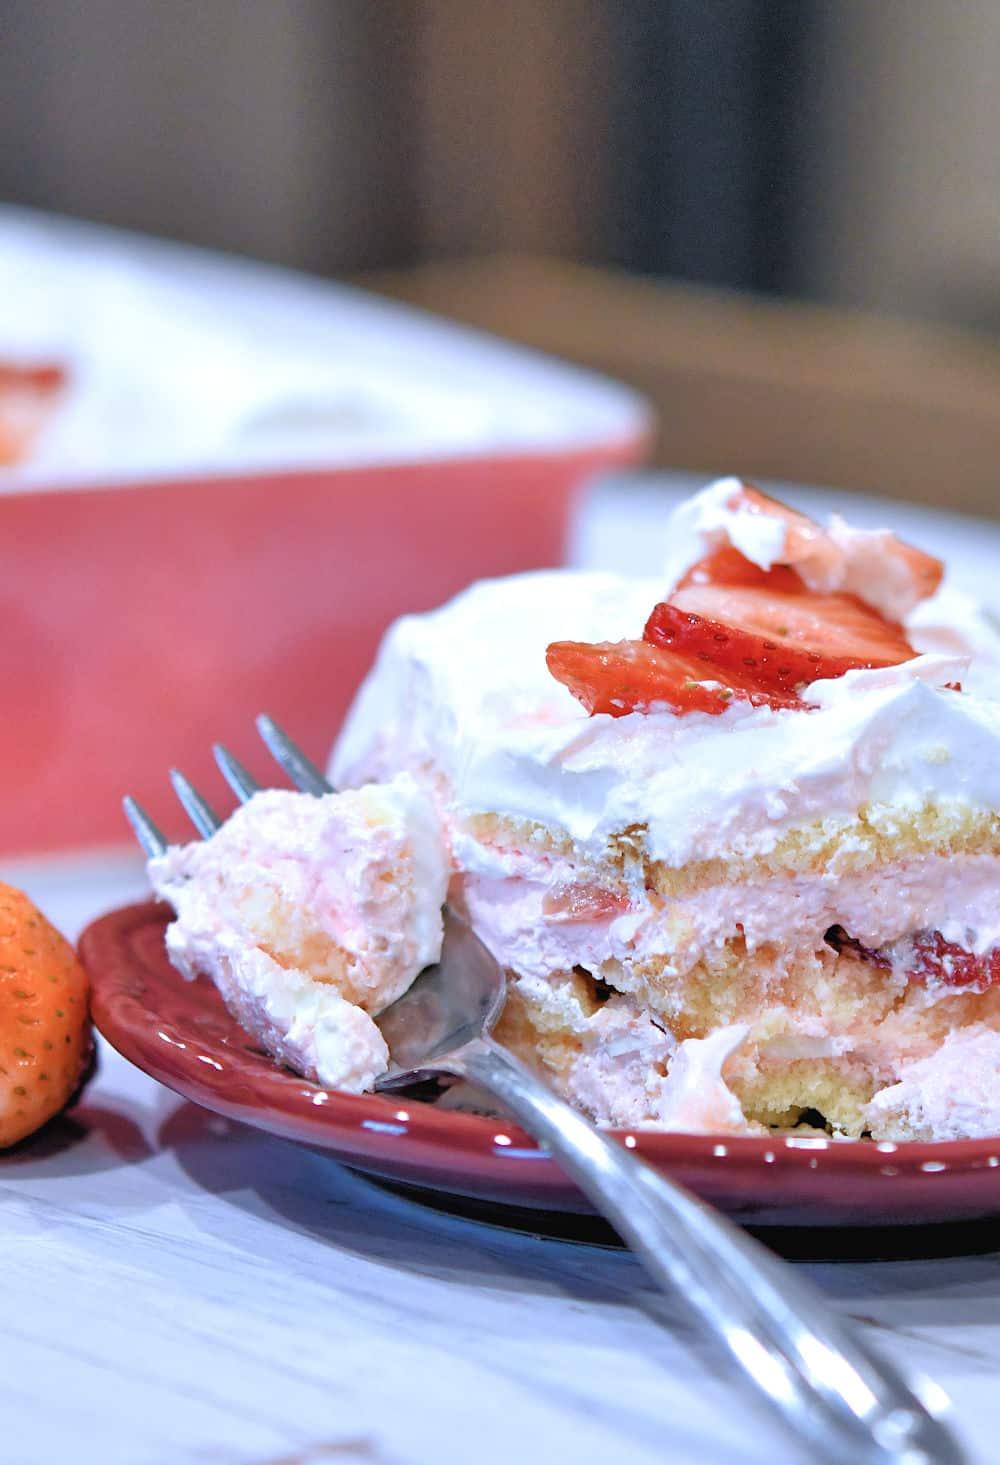 24Bite: Strawberry Tiramisu No Bake Layered Dessert Recipe by Christian Guzman